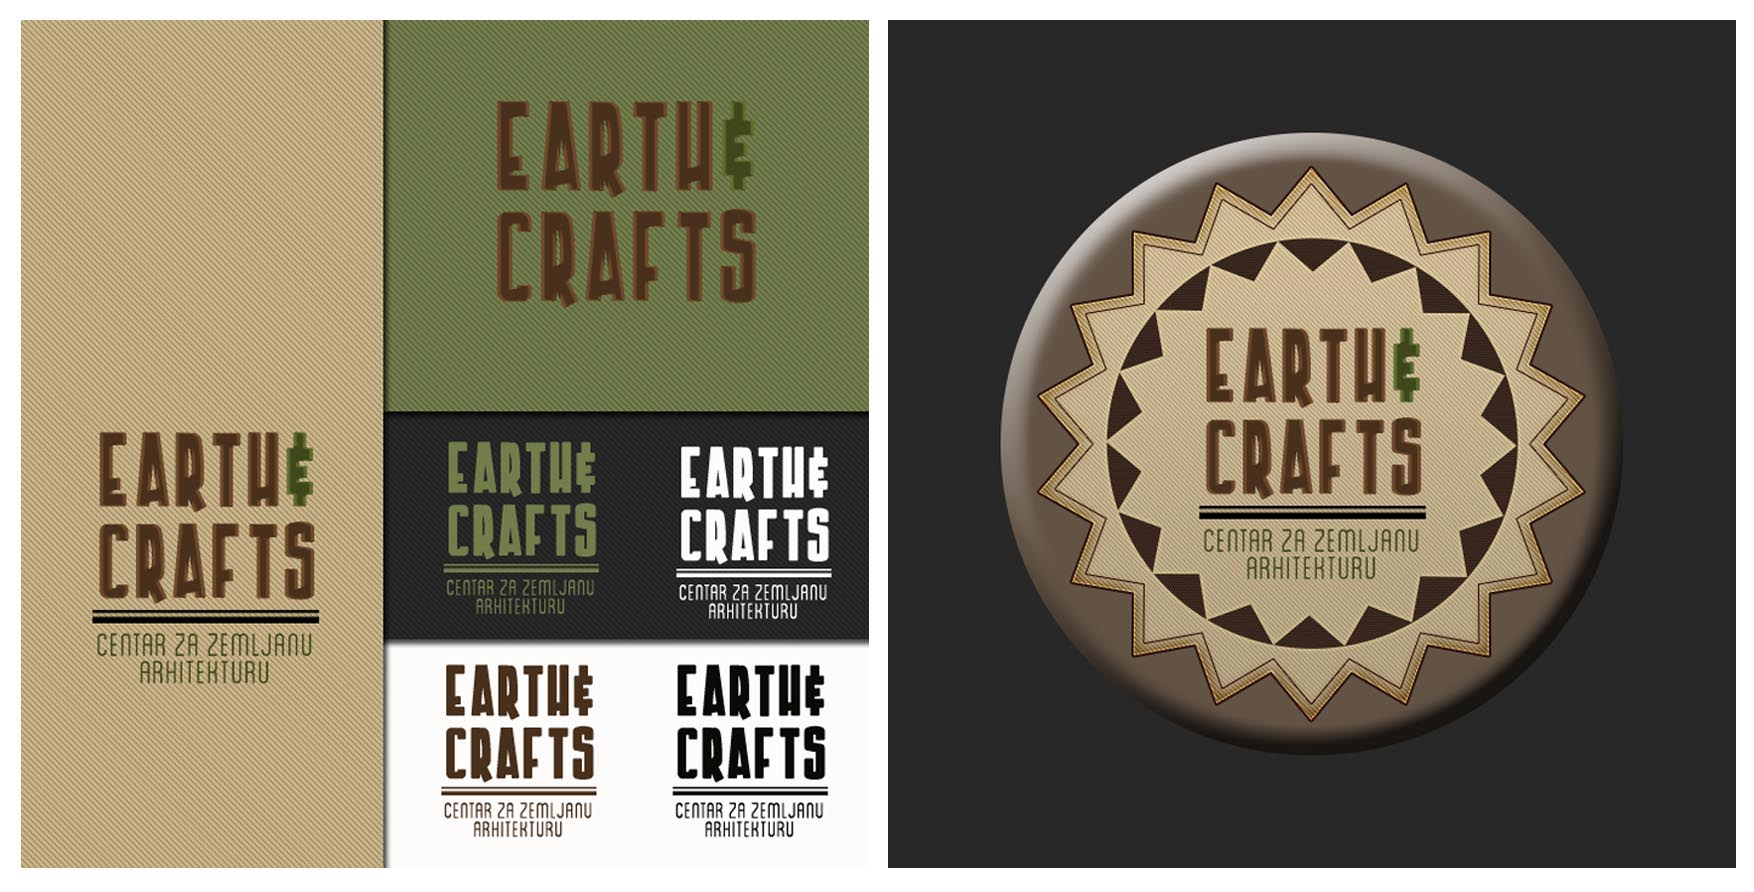 19 predlog logo EARTH&CRAFTS nevena nikolic visinatavanu@gmail.com